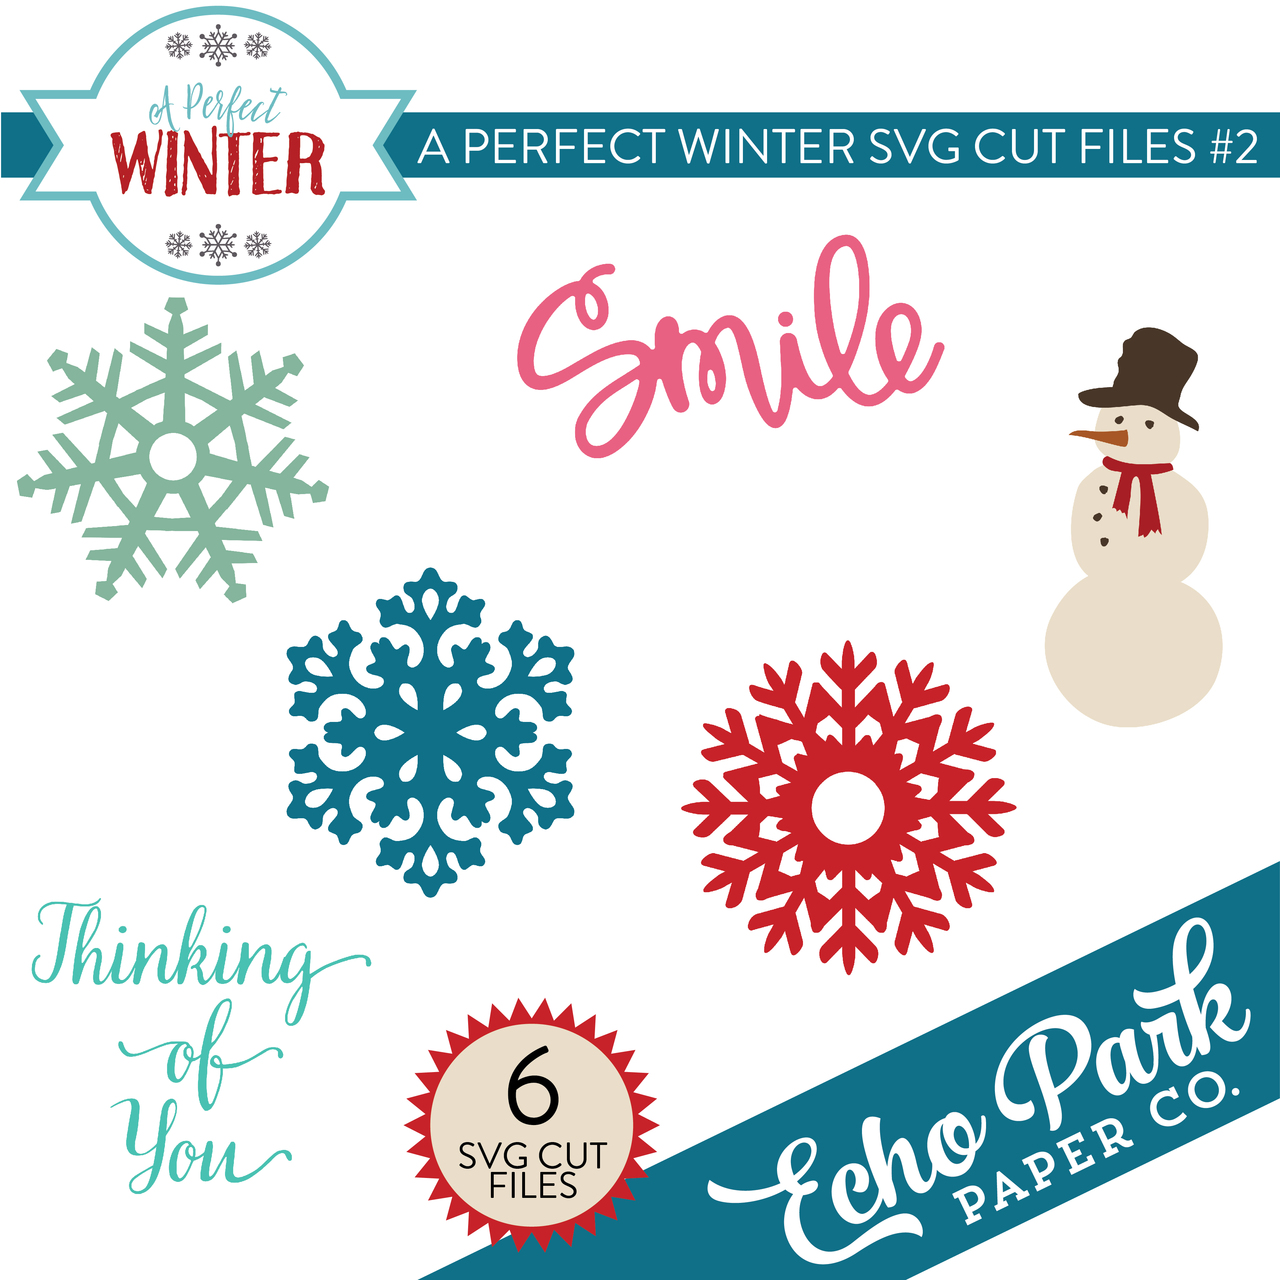 A Perfect Winter SVG Cut Files #2